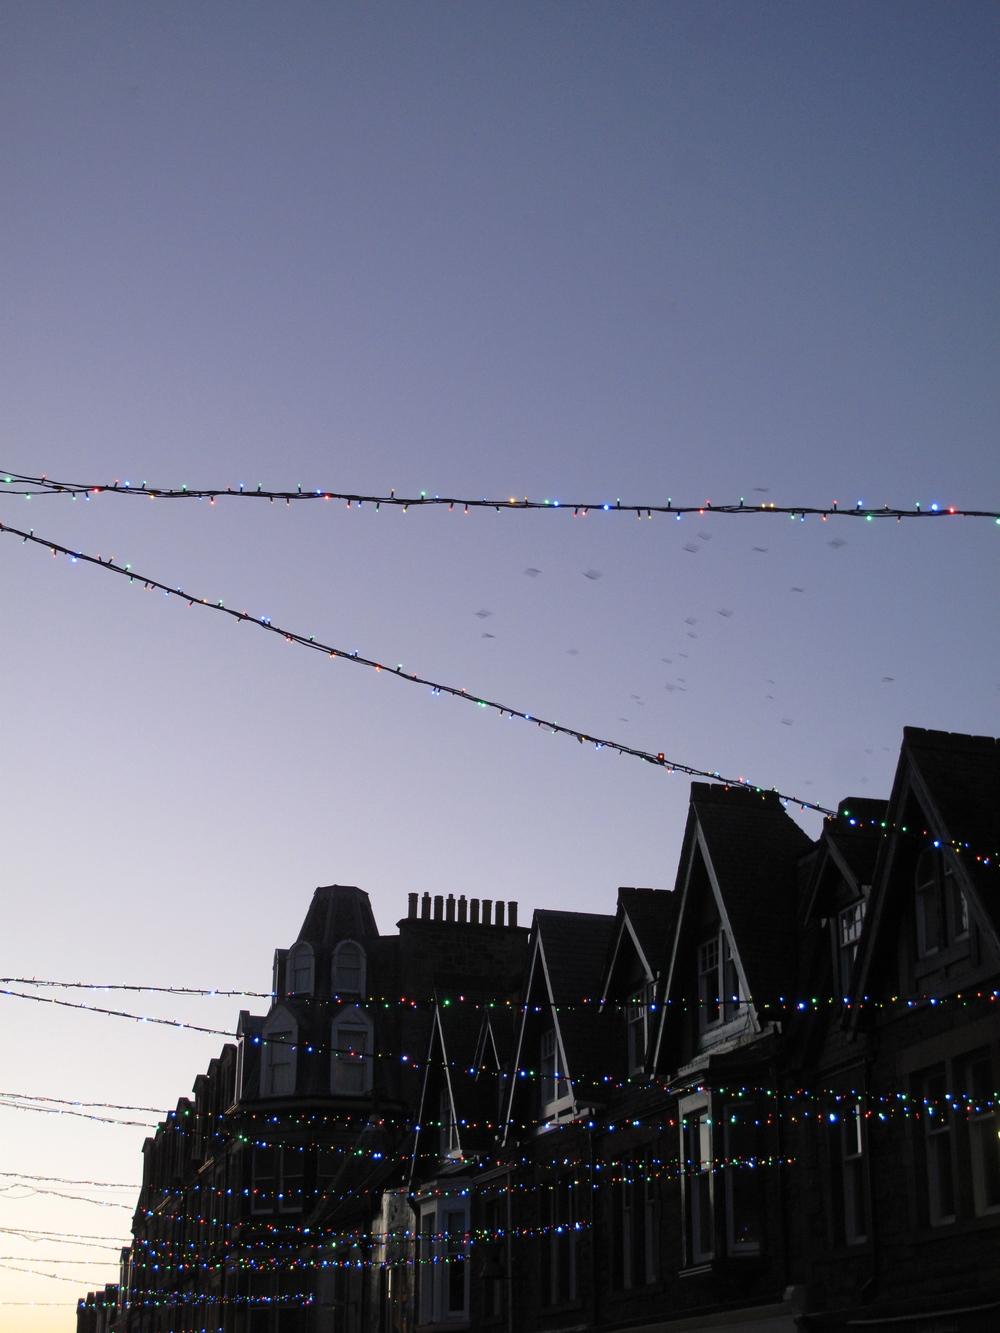 Christmas lights at dusk, North Berwick.